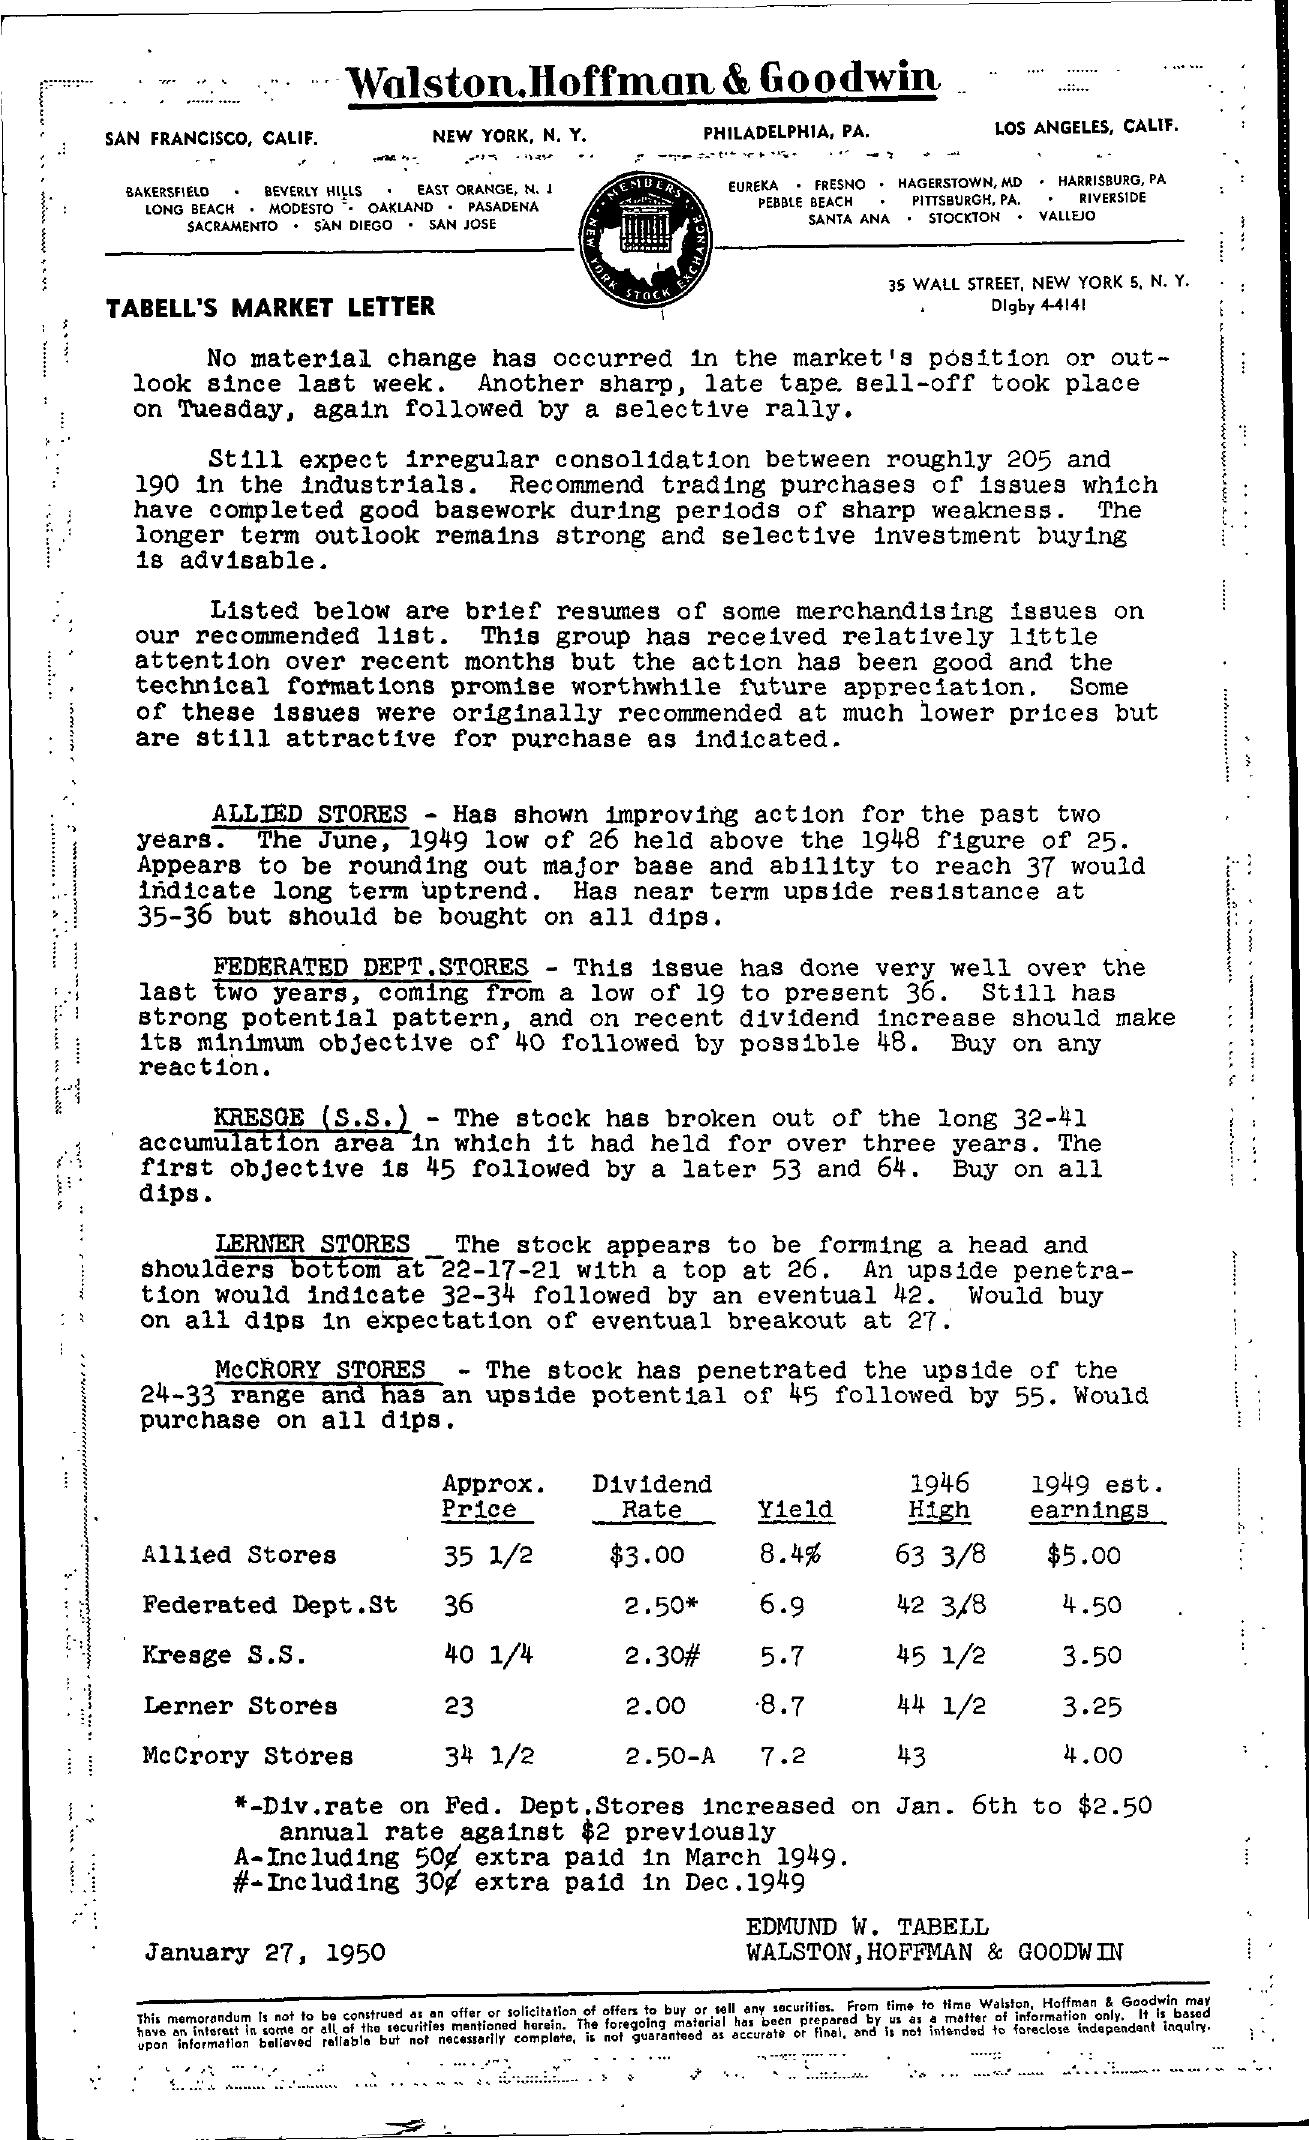 Tabell's Market Letter - January 27, 1950